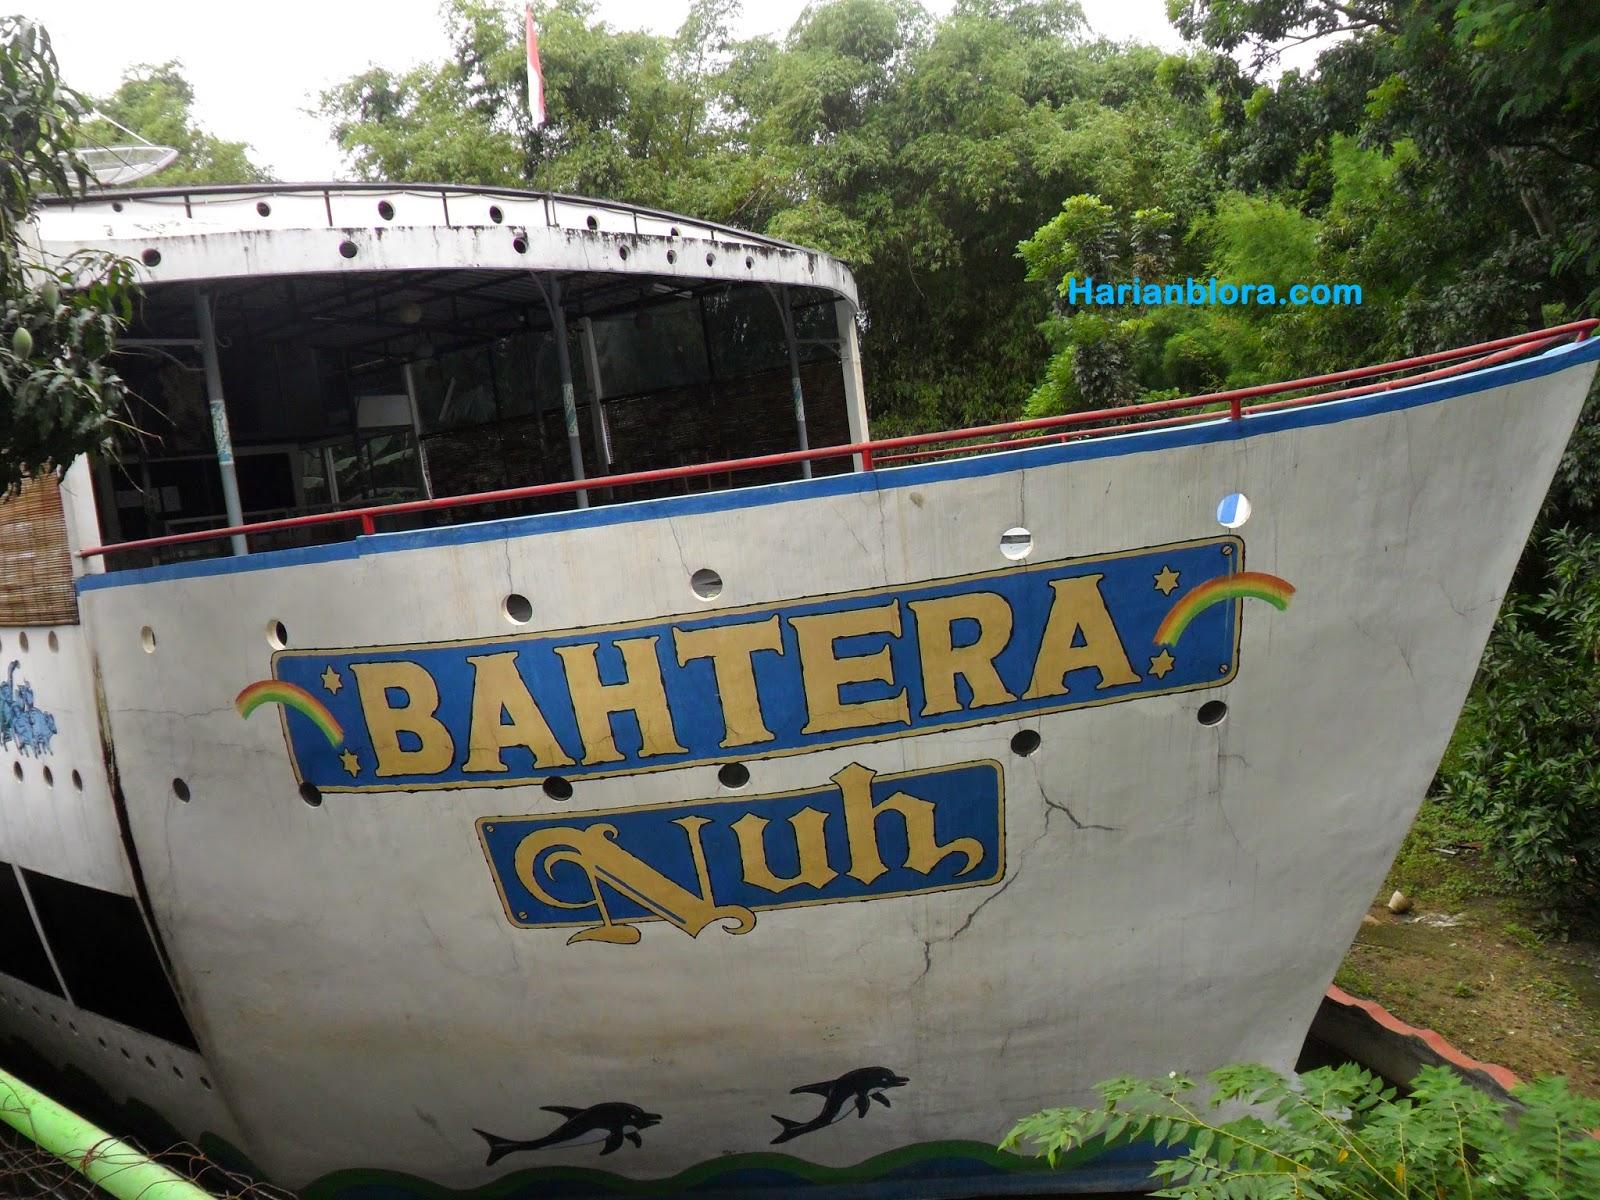 Bahtera Nuh Cafe Unik Berbentuk Kapal Blora Harian Kampung Bluron